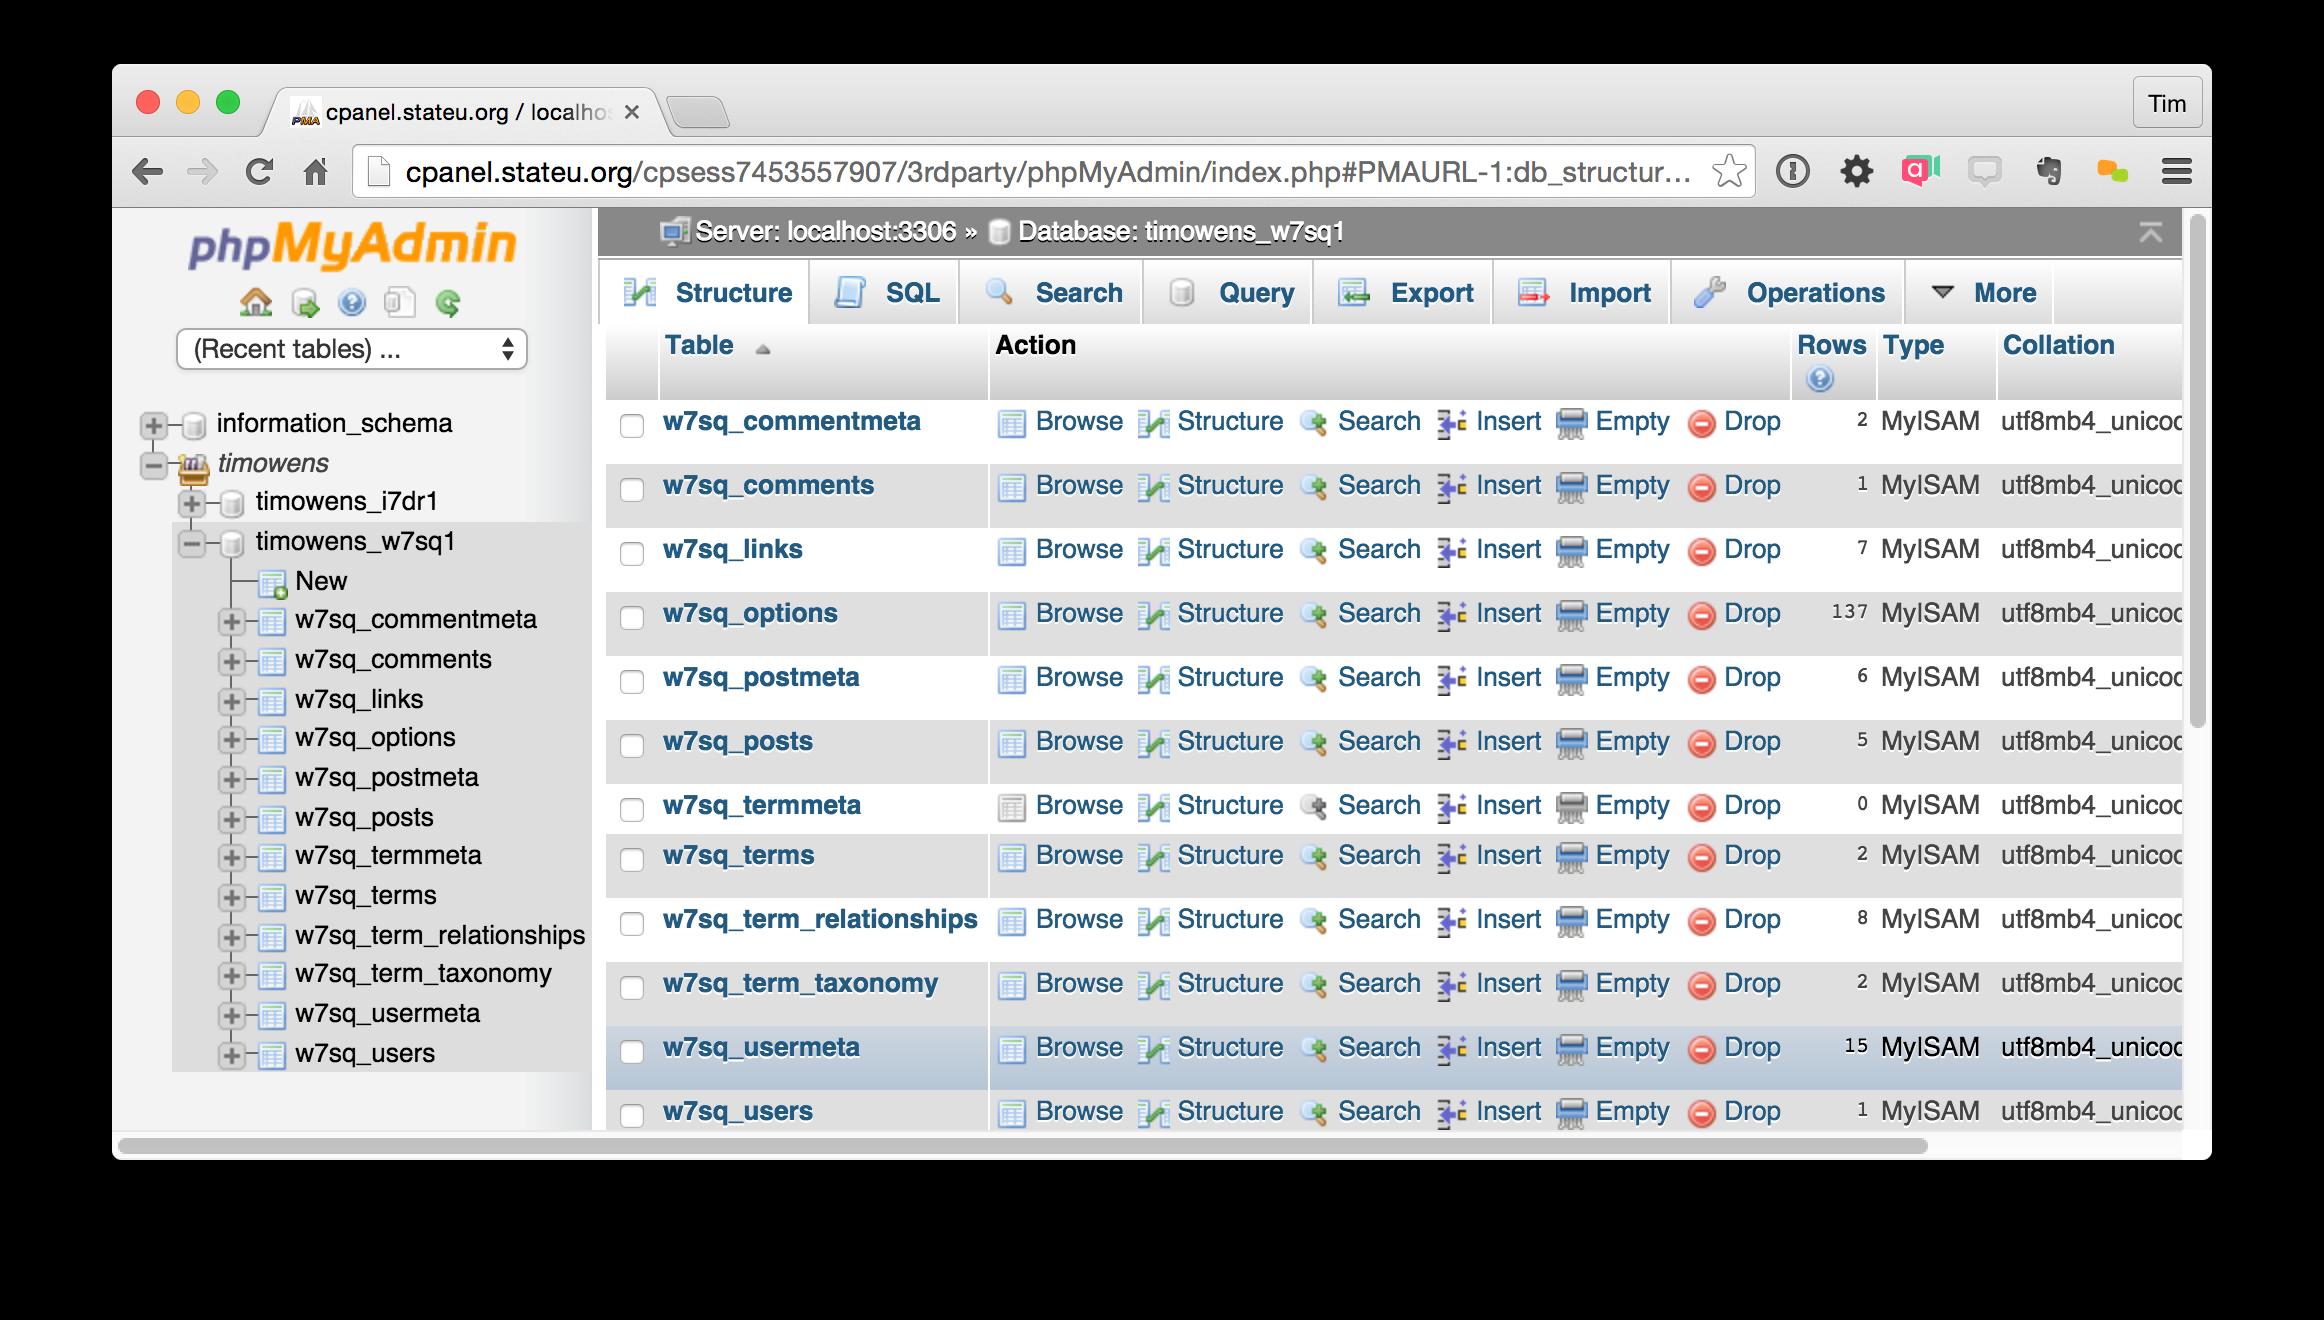 Screenshot of phpMyAdmin